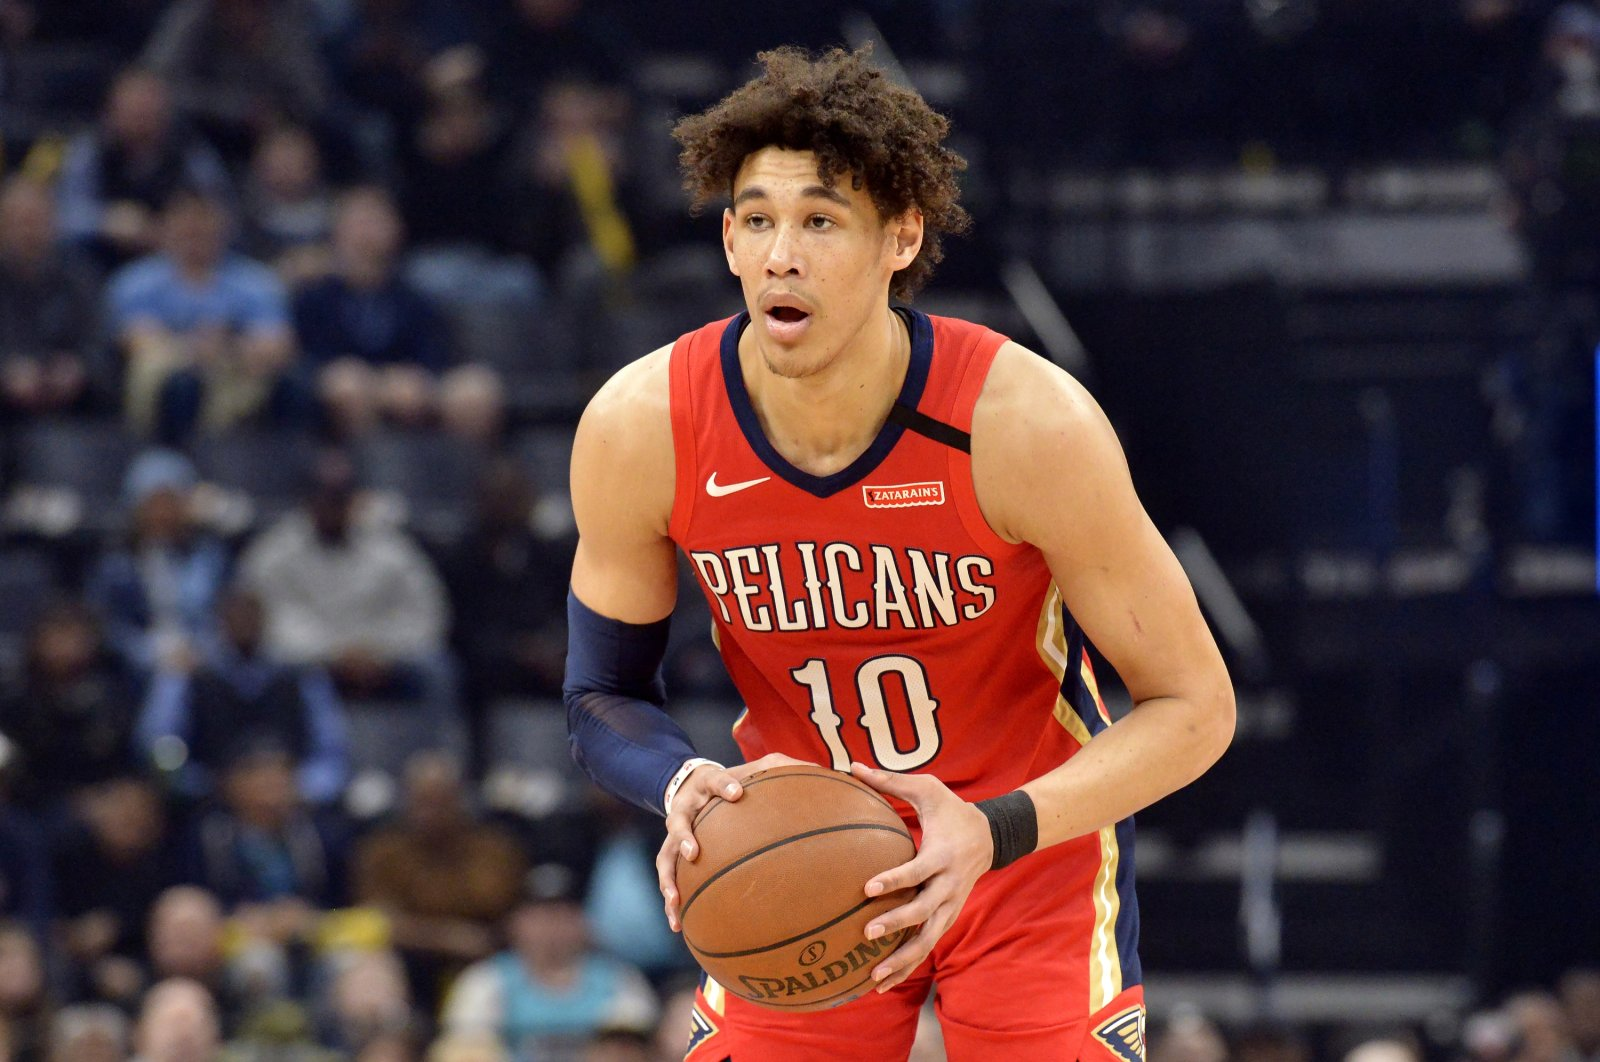 New Orleans Pelicans center Jaxson Hayes handles the ball in the first half of an NBA basketball game against the Memphis Grizzlies in Memphis, Tenn., U.S., Jan. 20, 2020, (AP File Photo)